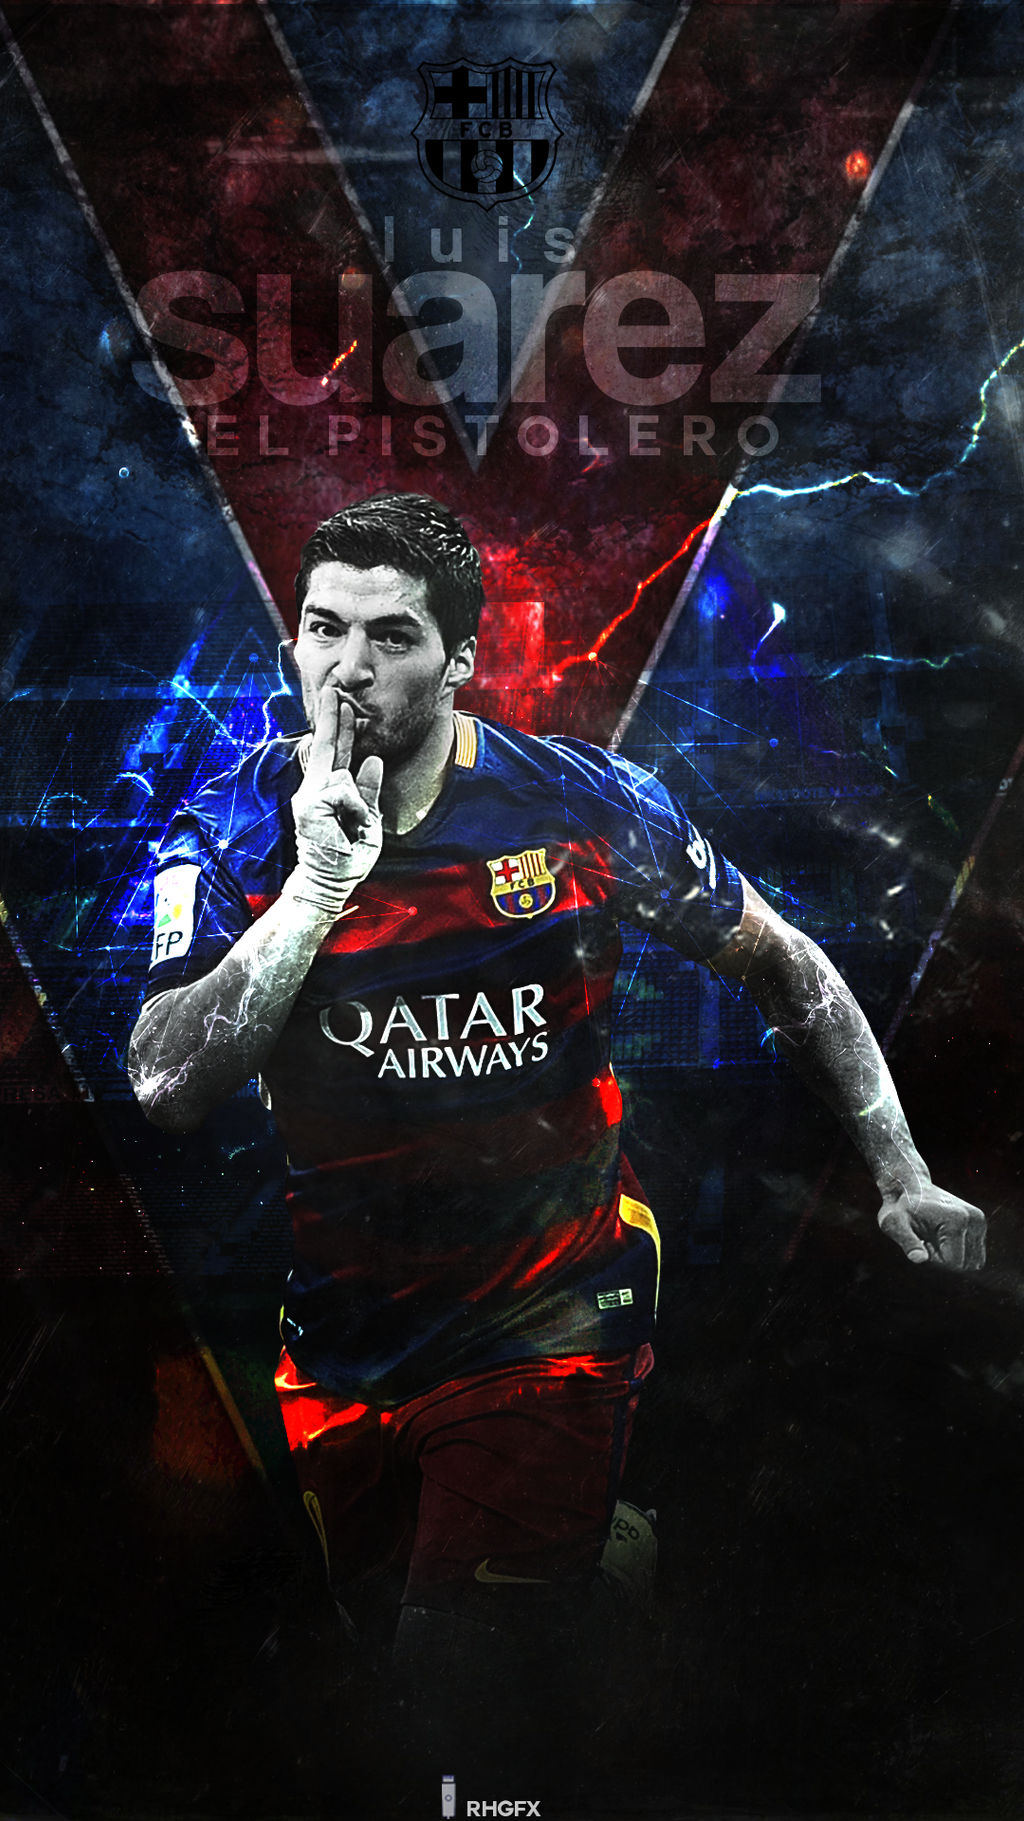 Luis Suarez FC Barcelona 2016 Wallpaper By RHGFX2 On DeviantArt